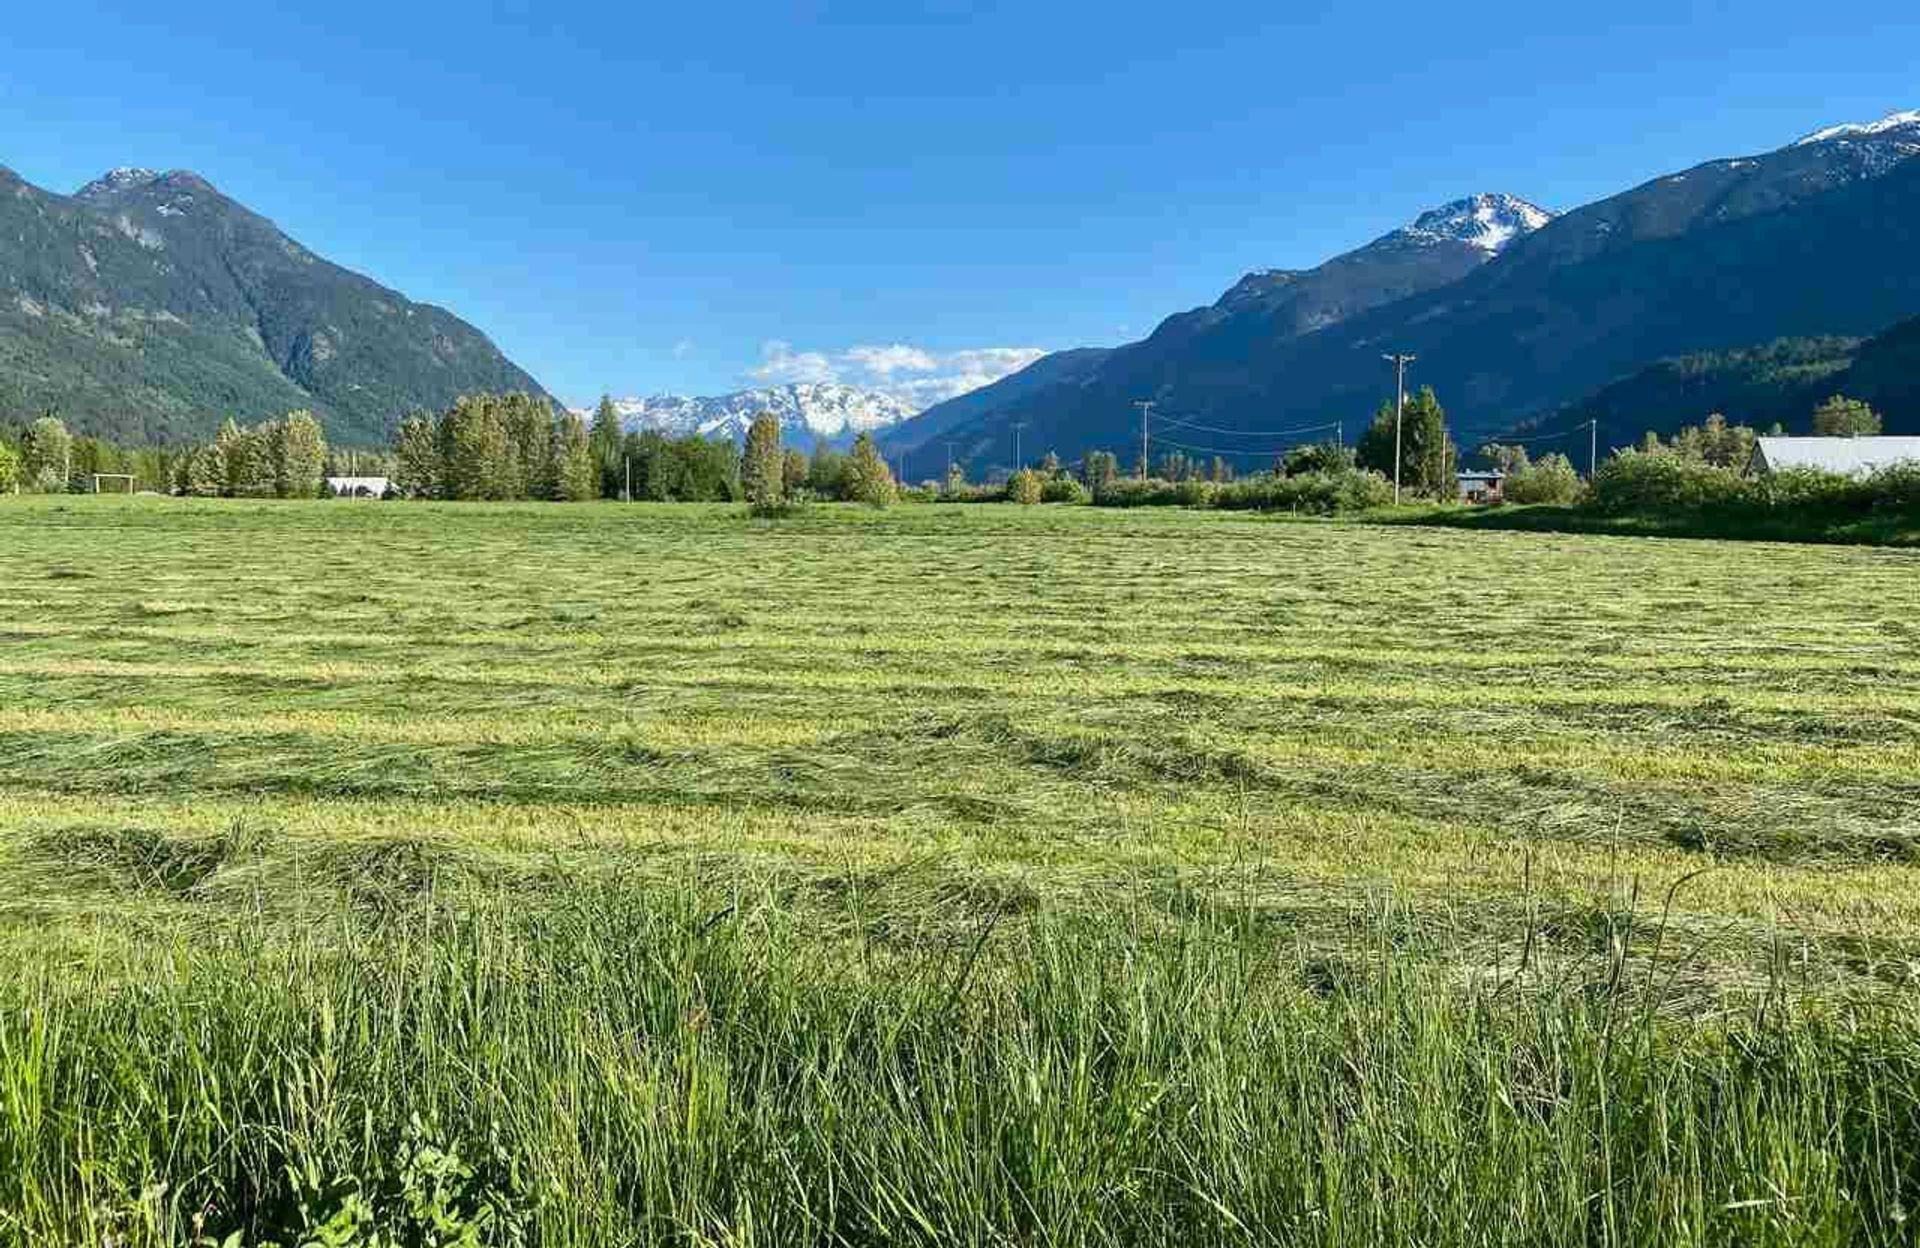 390-dill-road-pemberton-meadows-pemberton-17 at 390 Dill Road, Pemberton Meadows, Pemberton